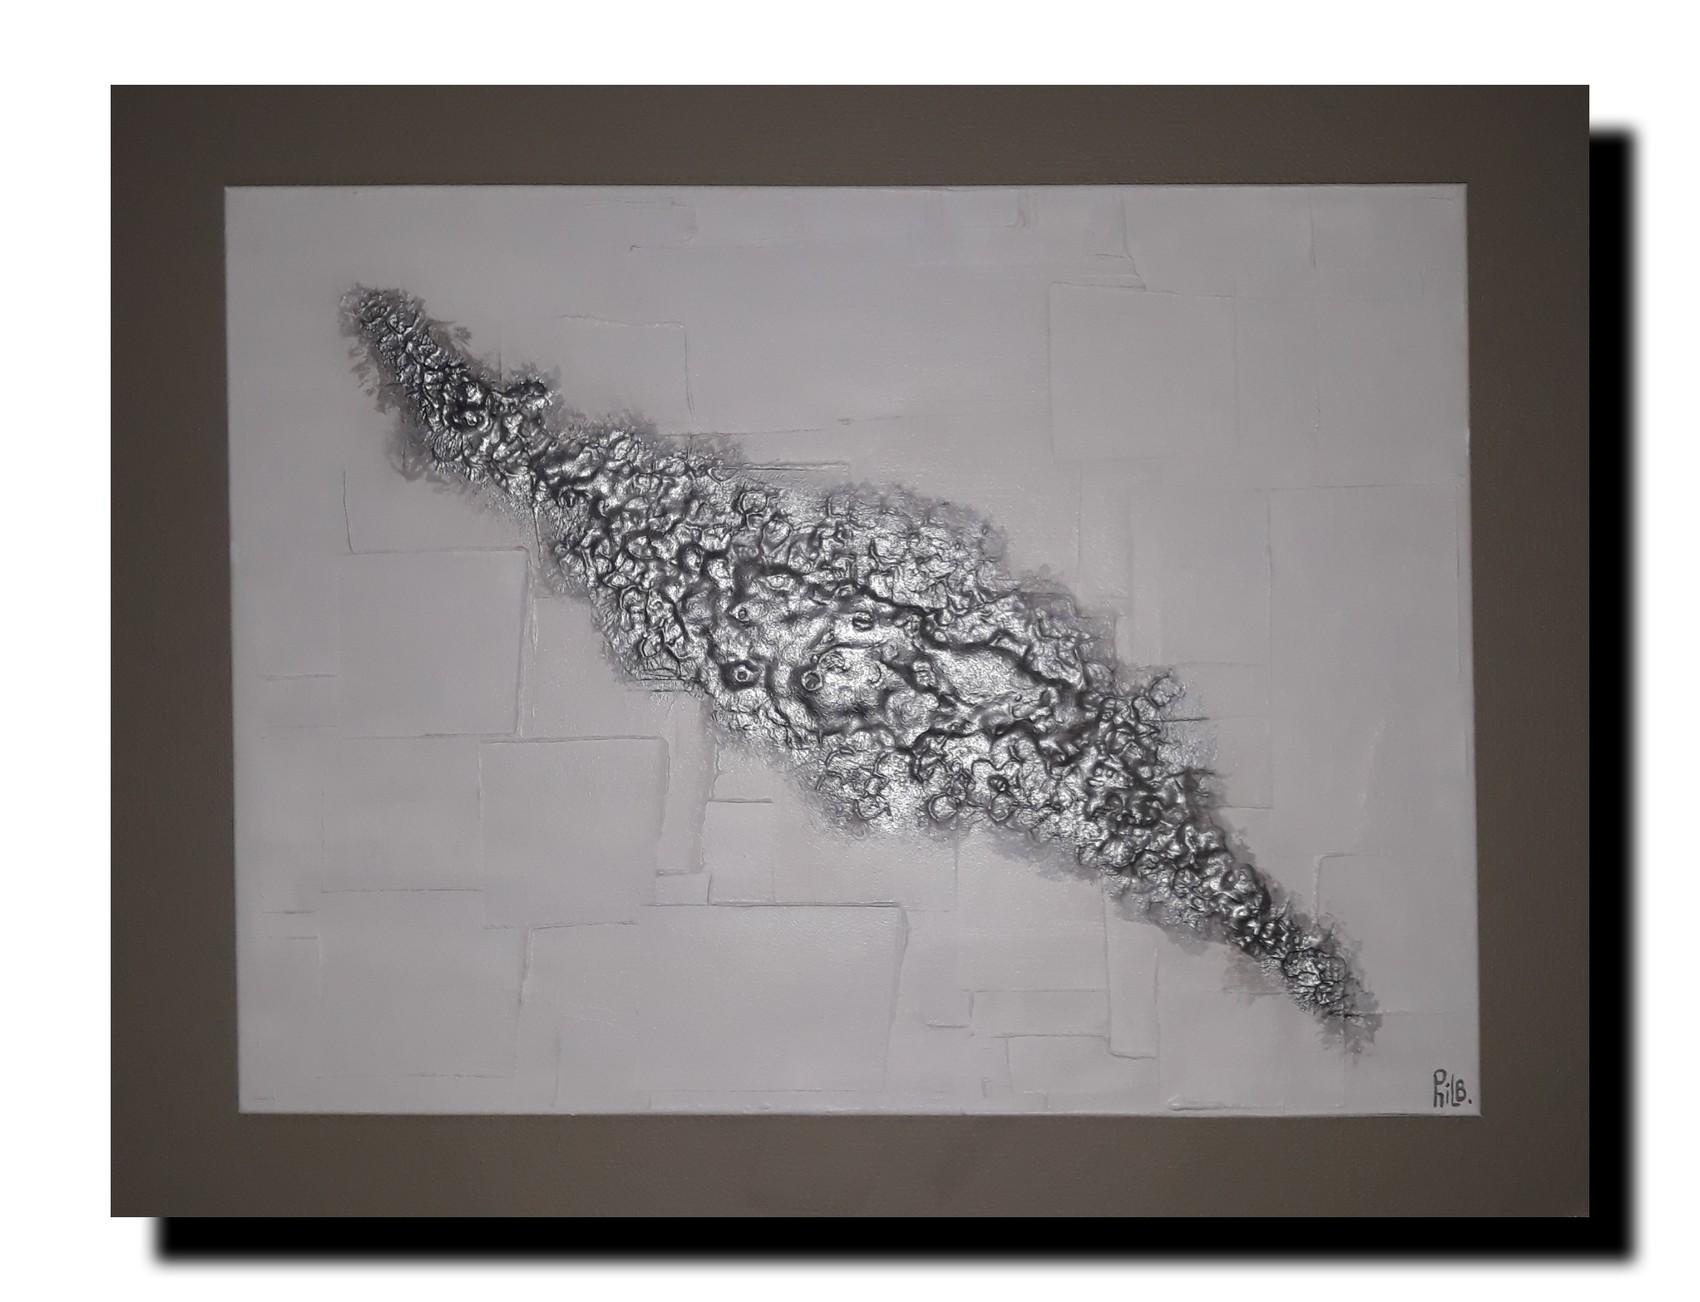 Silver Laundering (Blanchiment d'Argent)